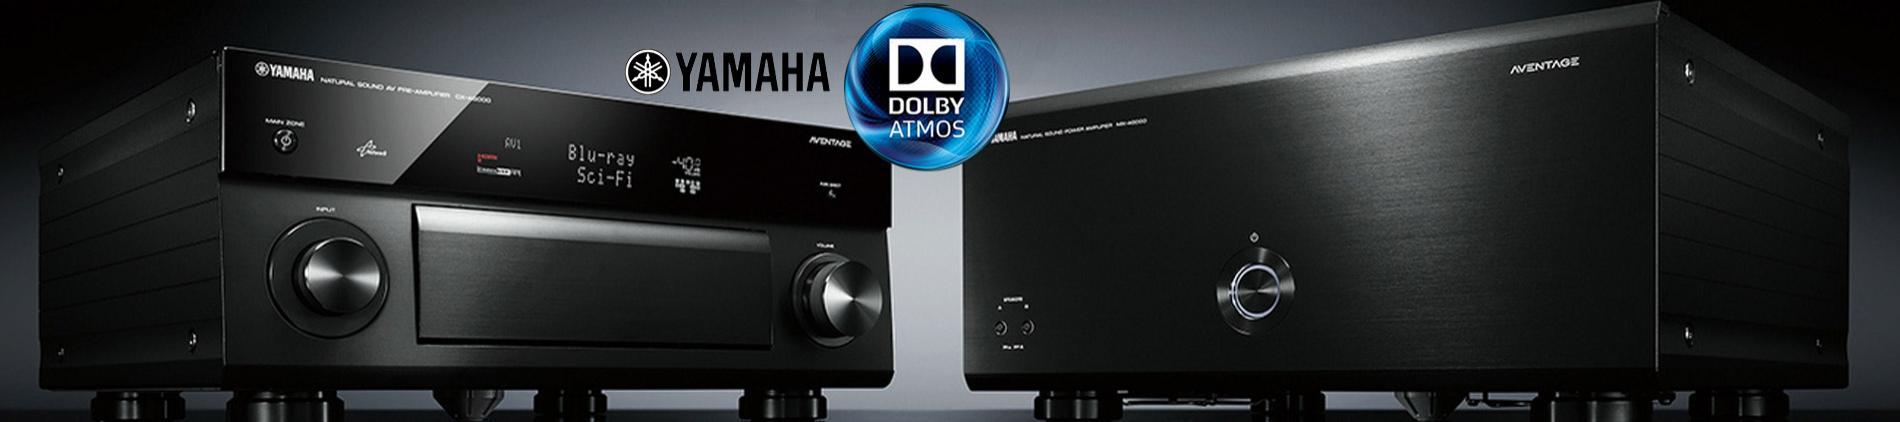 Yamaha Dolby Atmos